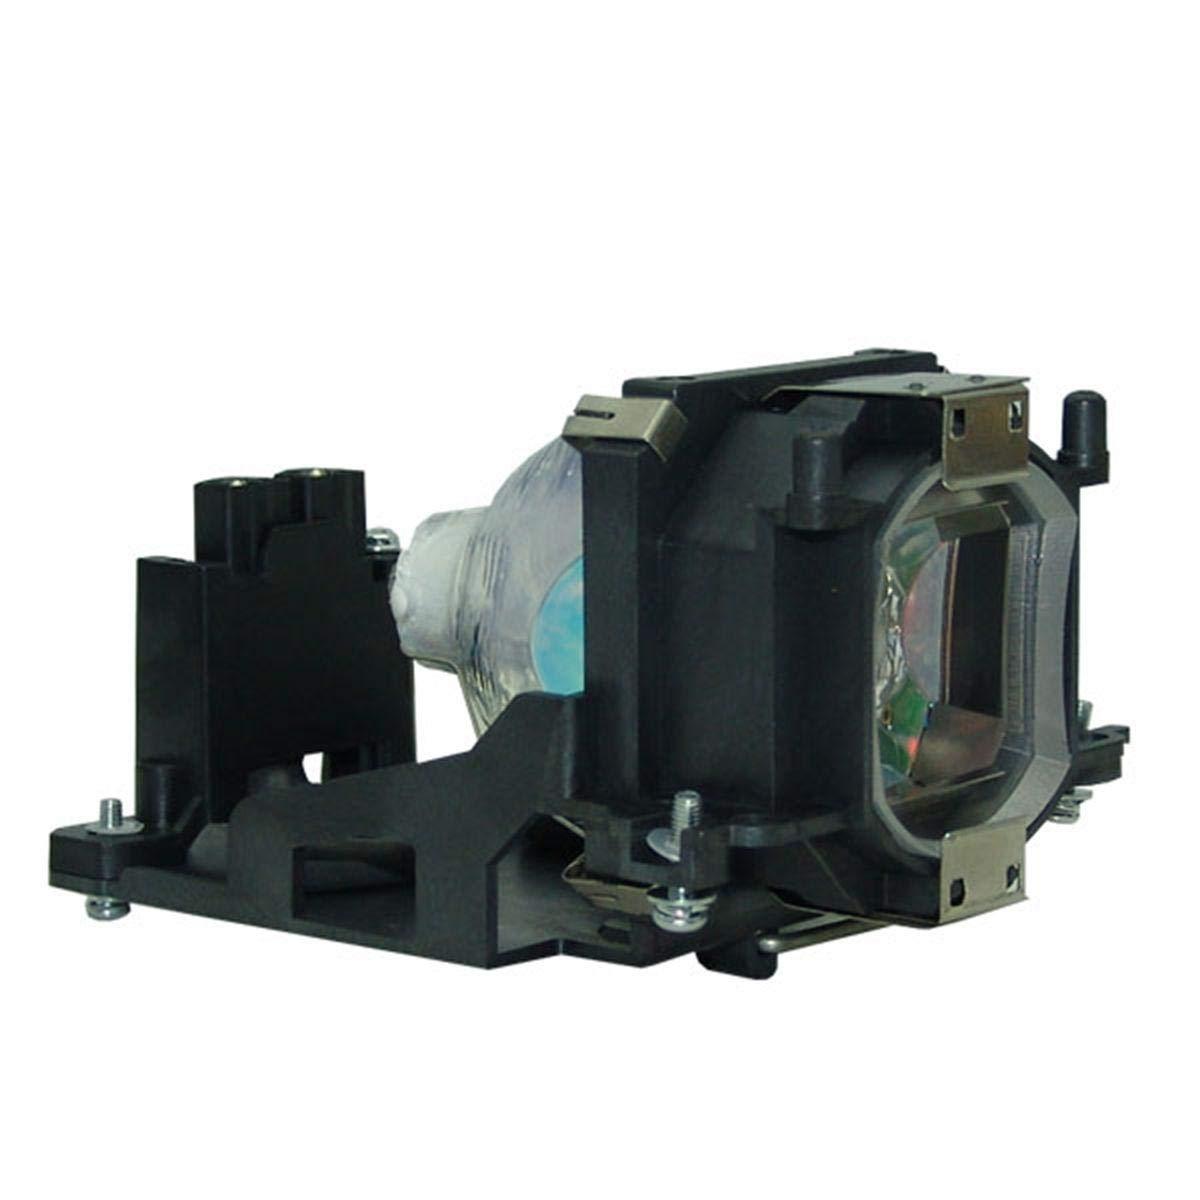 LMP-H130 LMPH130 互換ランプ Sony VPL-HS50 HS50 VPL-HS51 HS51 VPL-HS60 HS60プロジェクター用   B07H7M244F